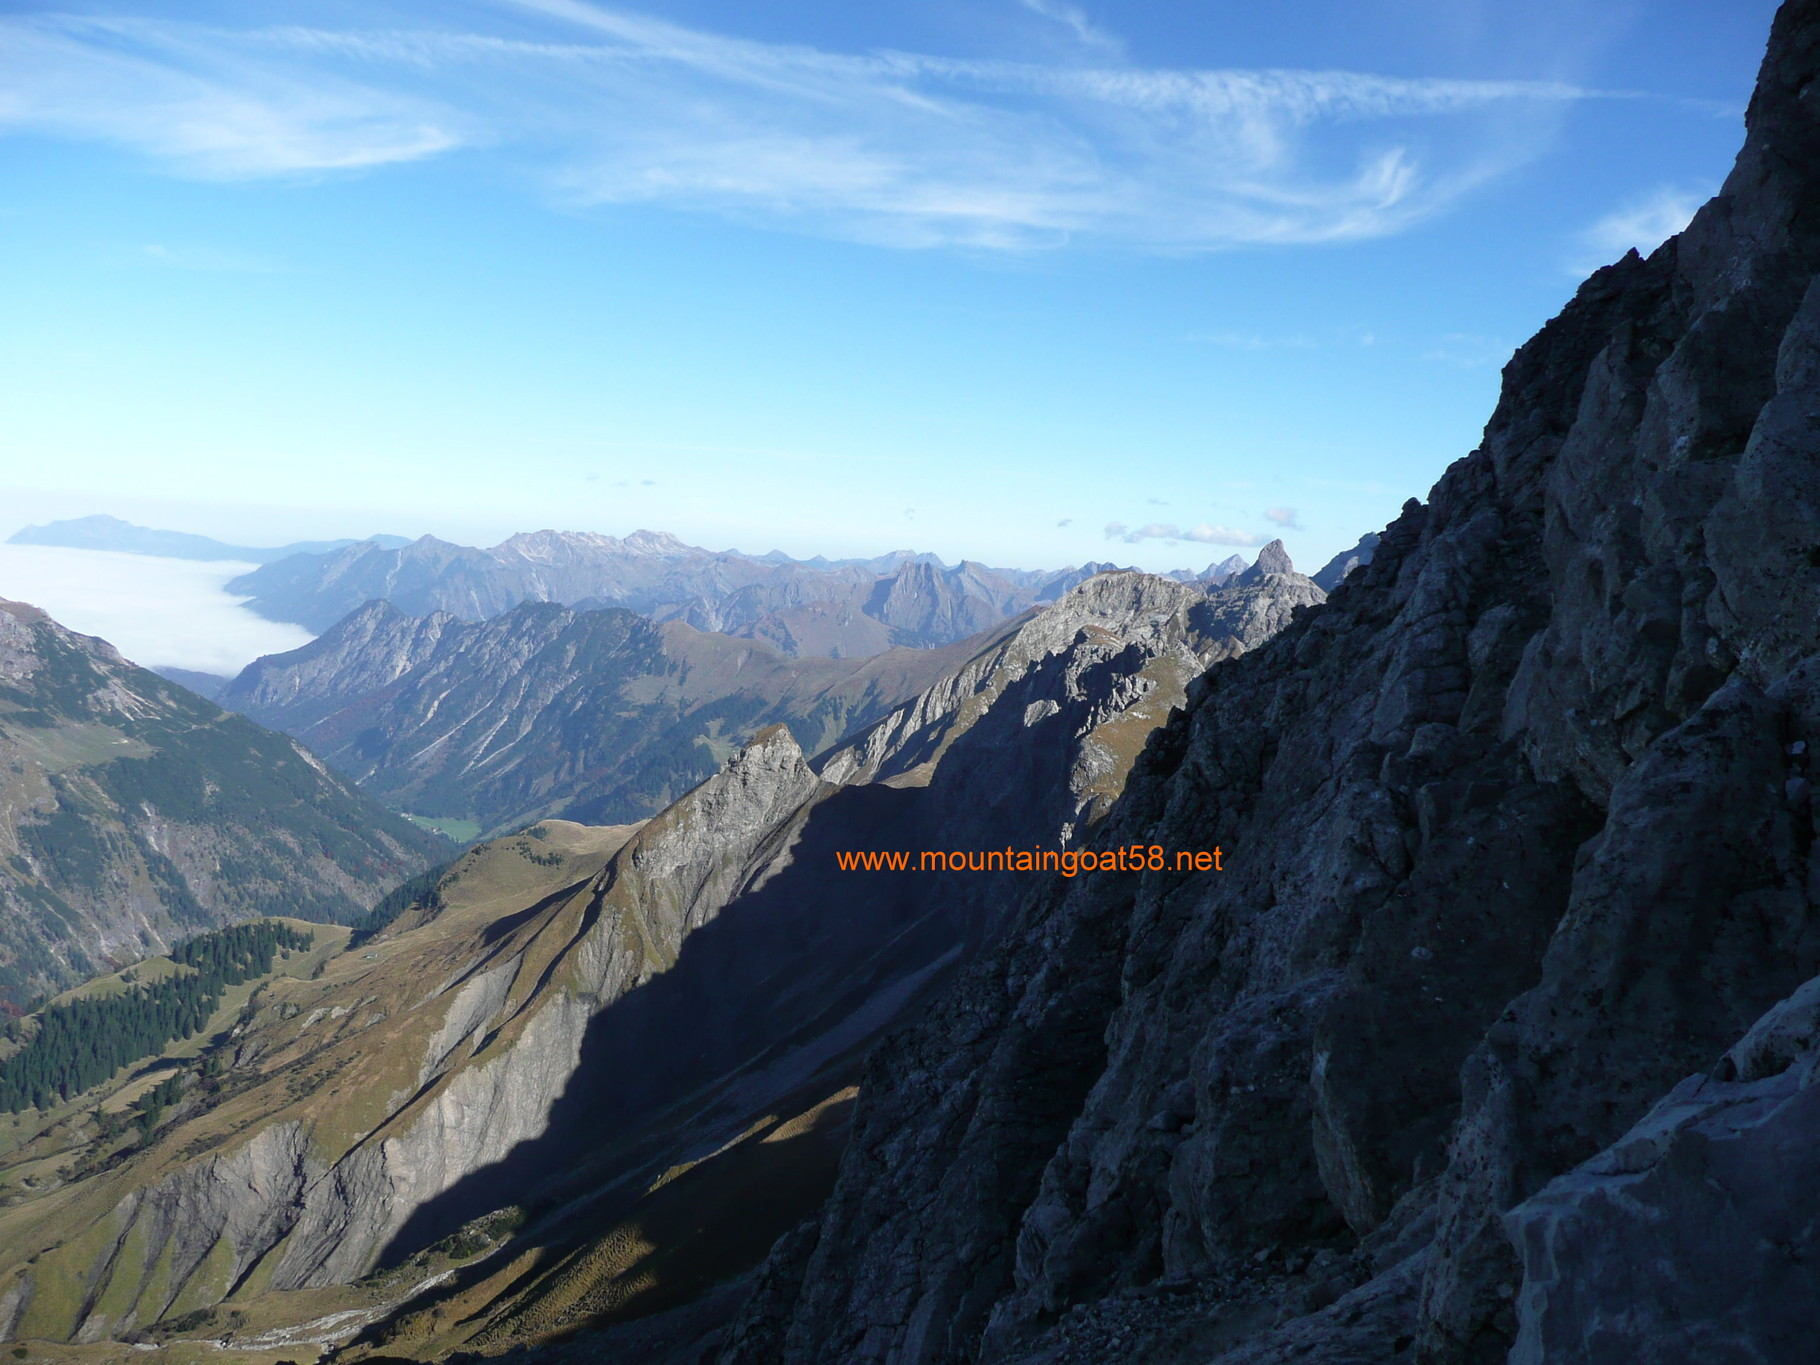 (c) Mountaingoat58.net